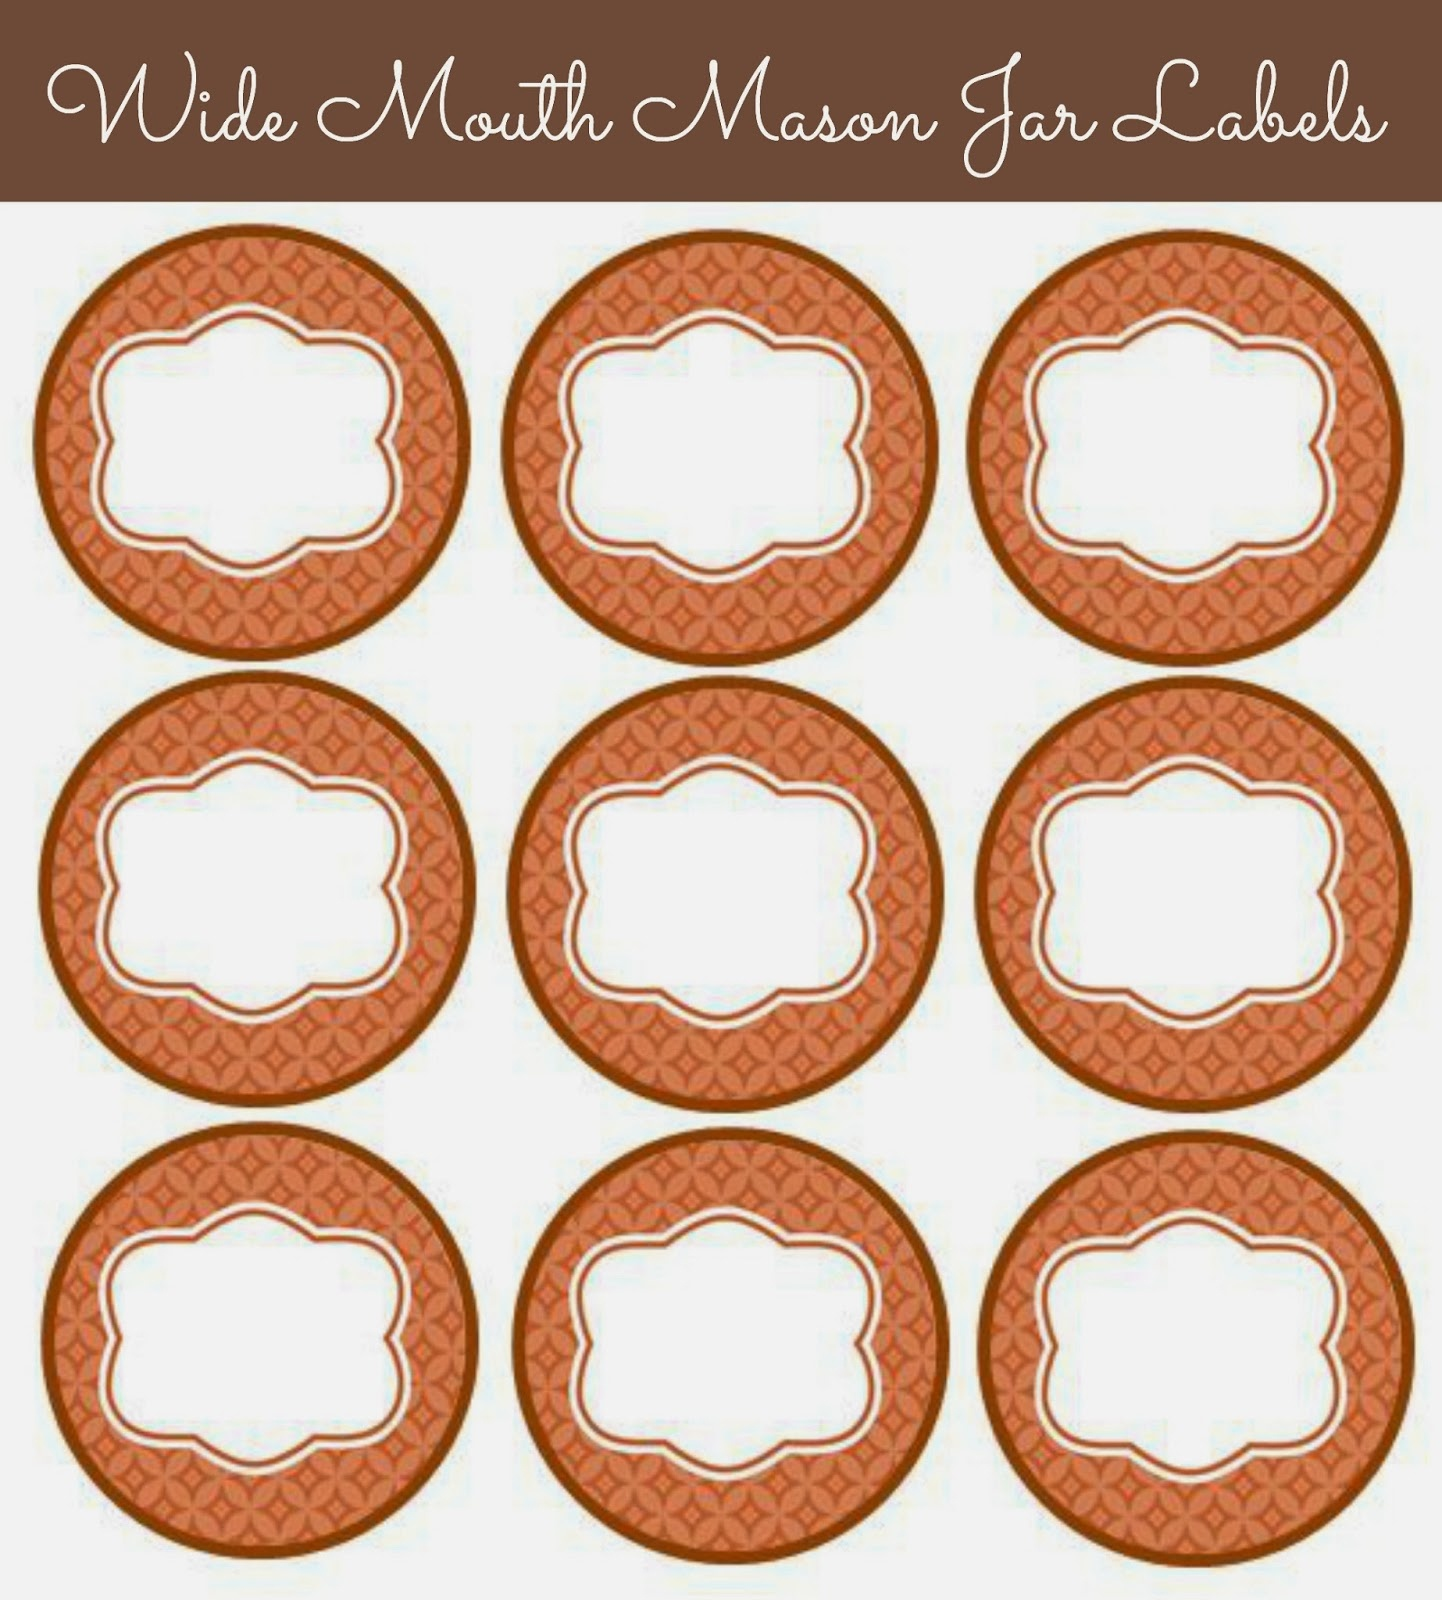 56 Cute Mason Jar Labels | Kittybabylove - Free Printable Mason Jar Labels Template